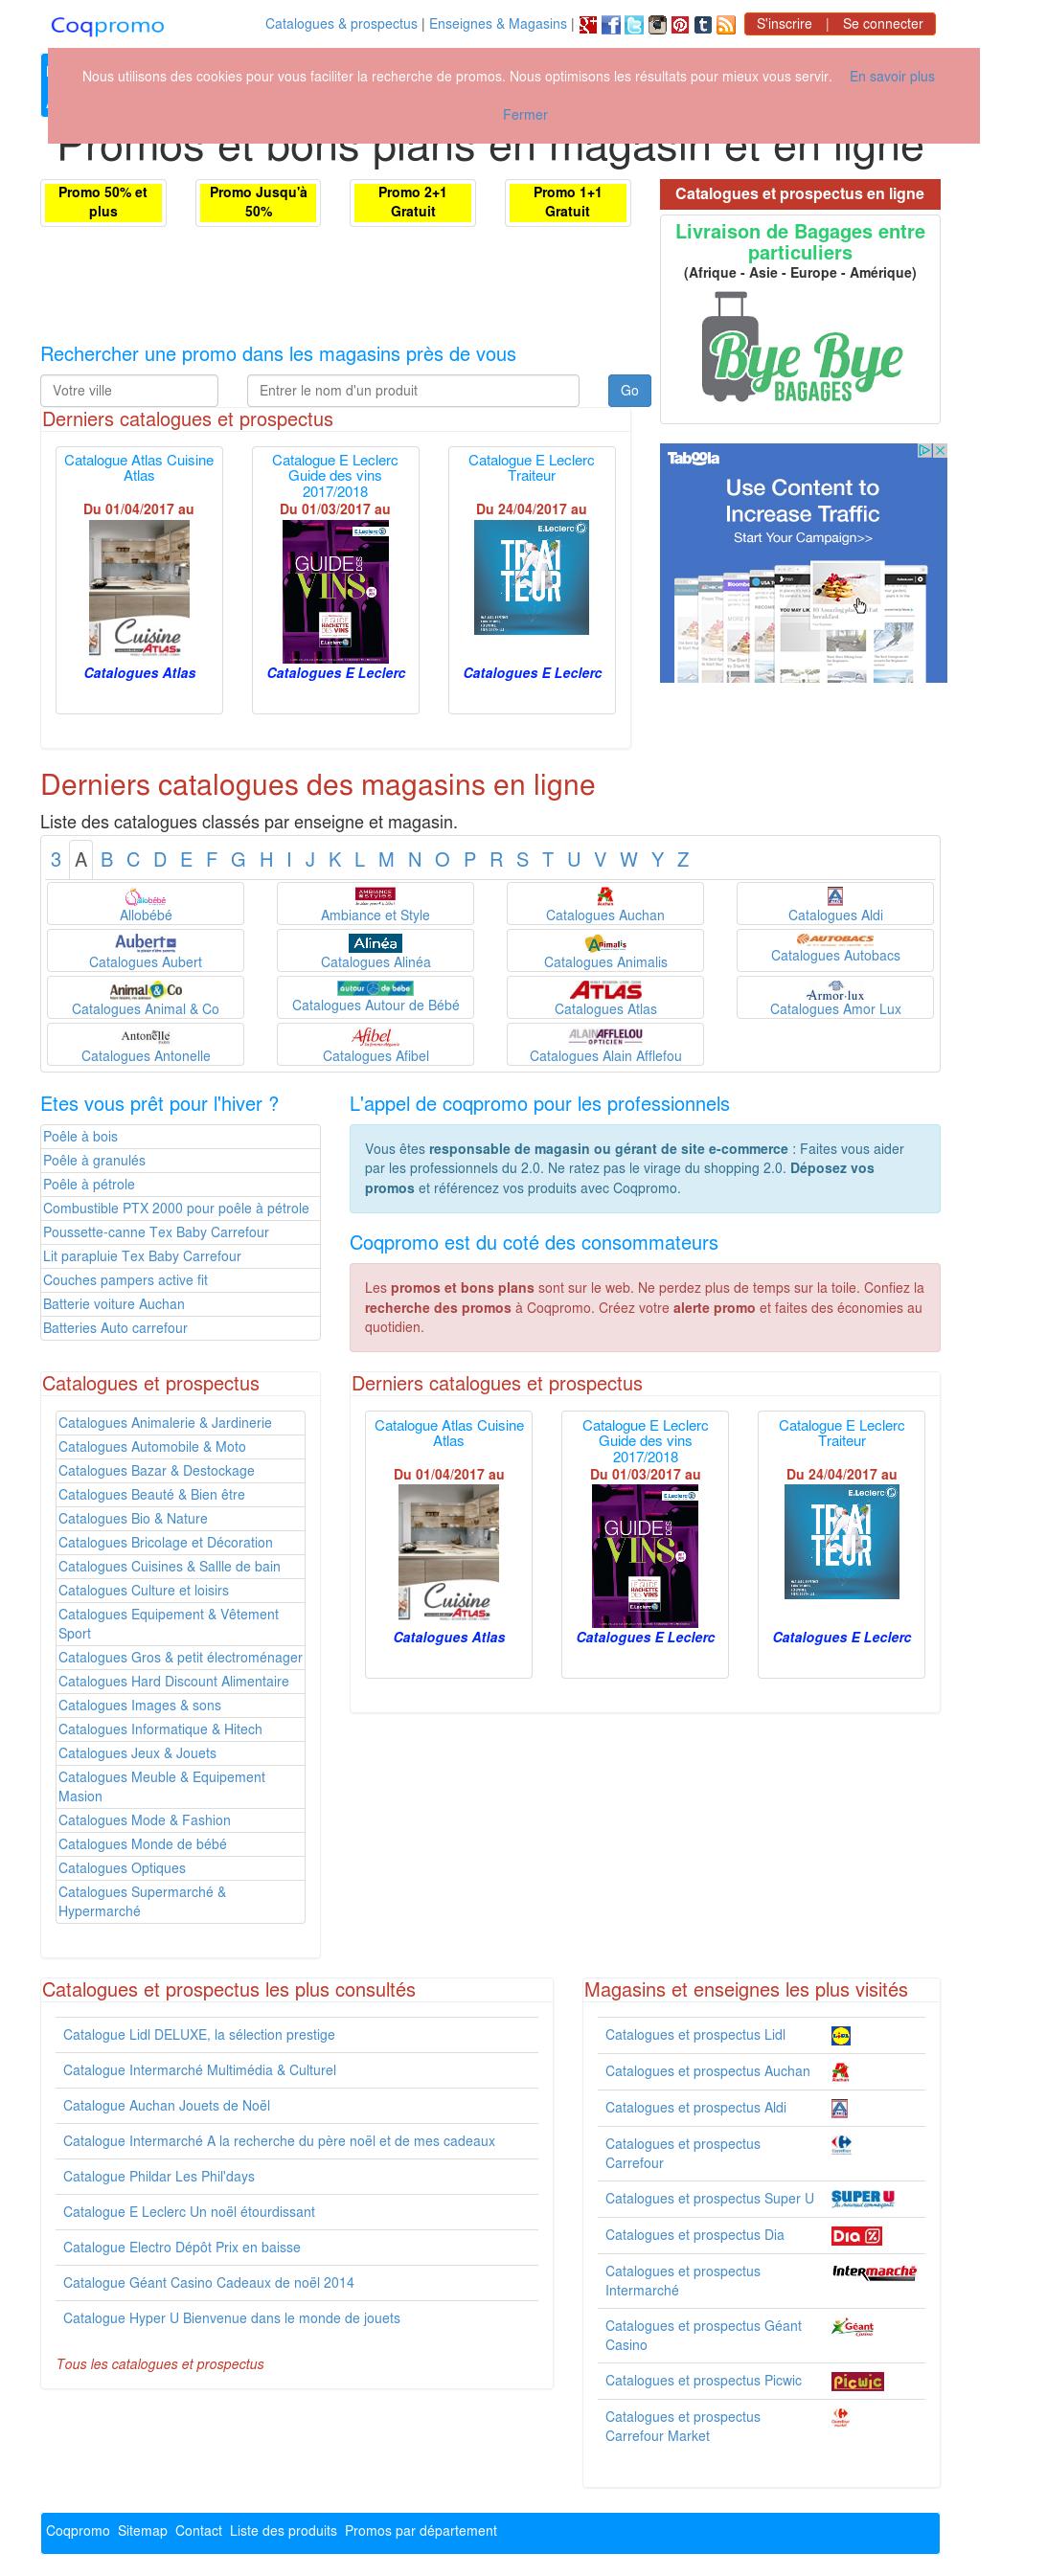 alinea catalogue noel 2018 Coqpromo : Le Coq De Promos Vous Alerte Competitors, Revenue and  alinea catalogue noel 2018